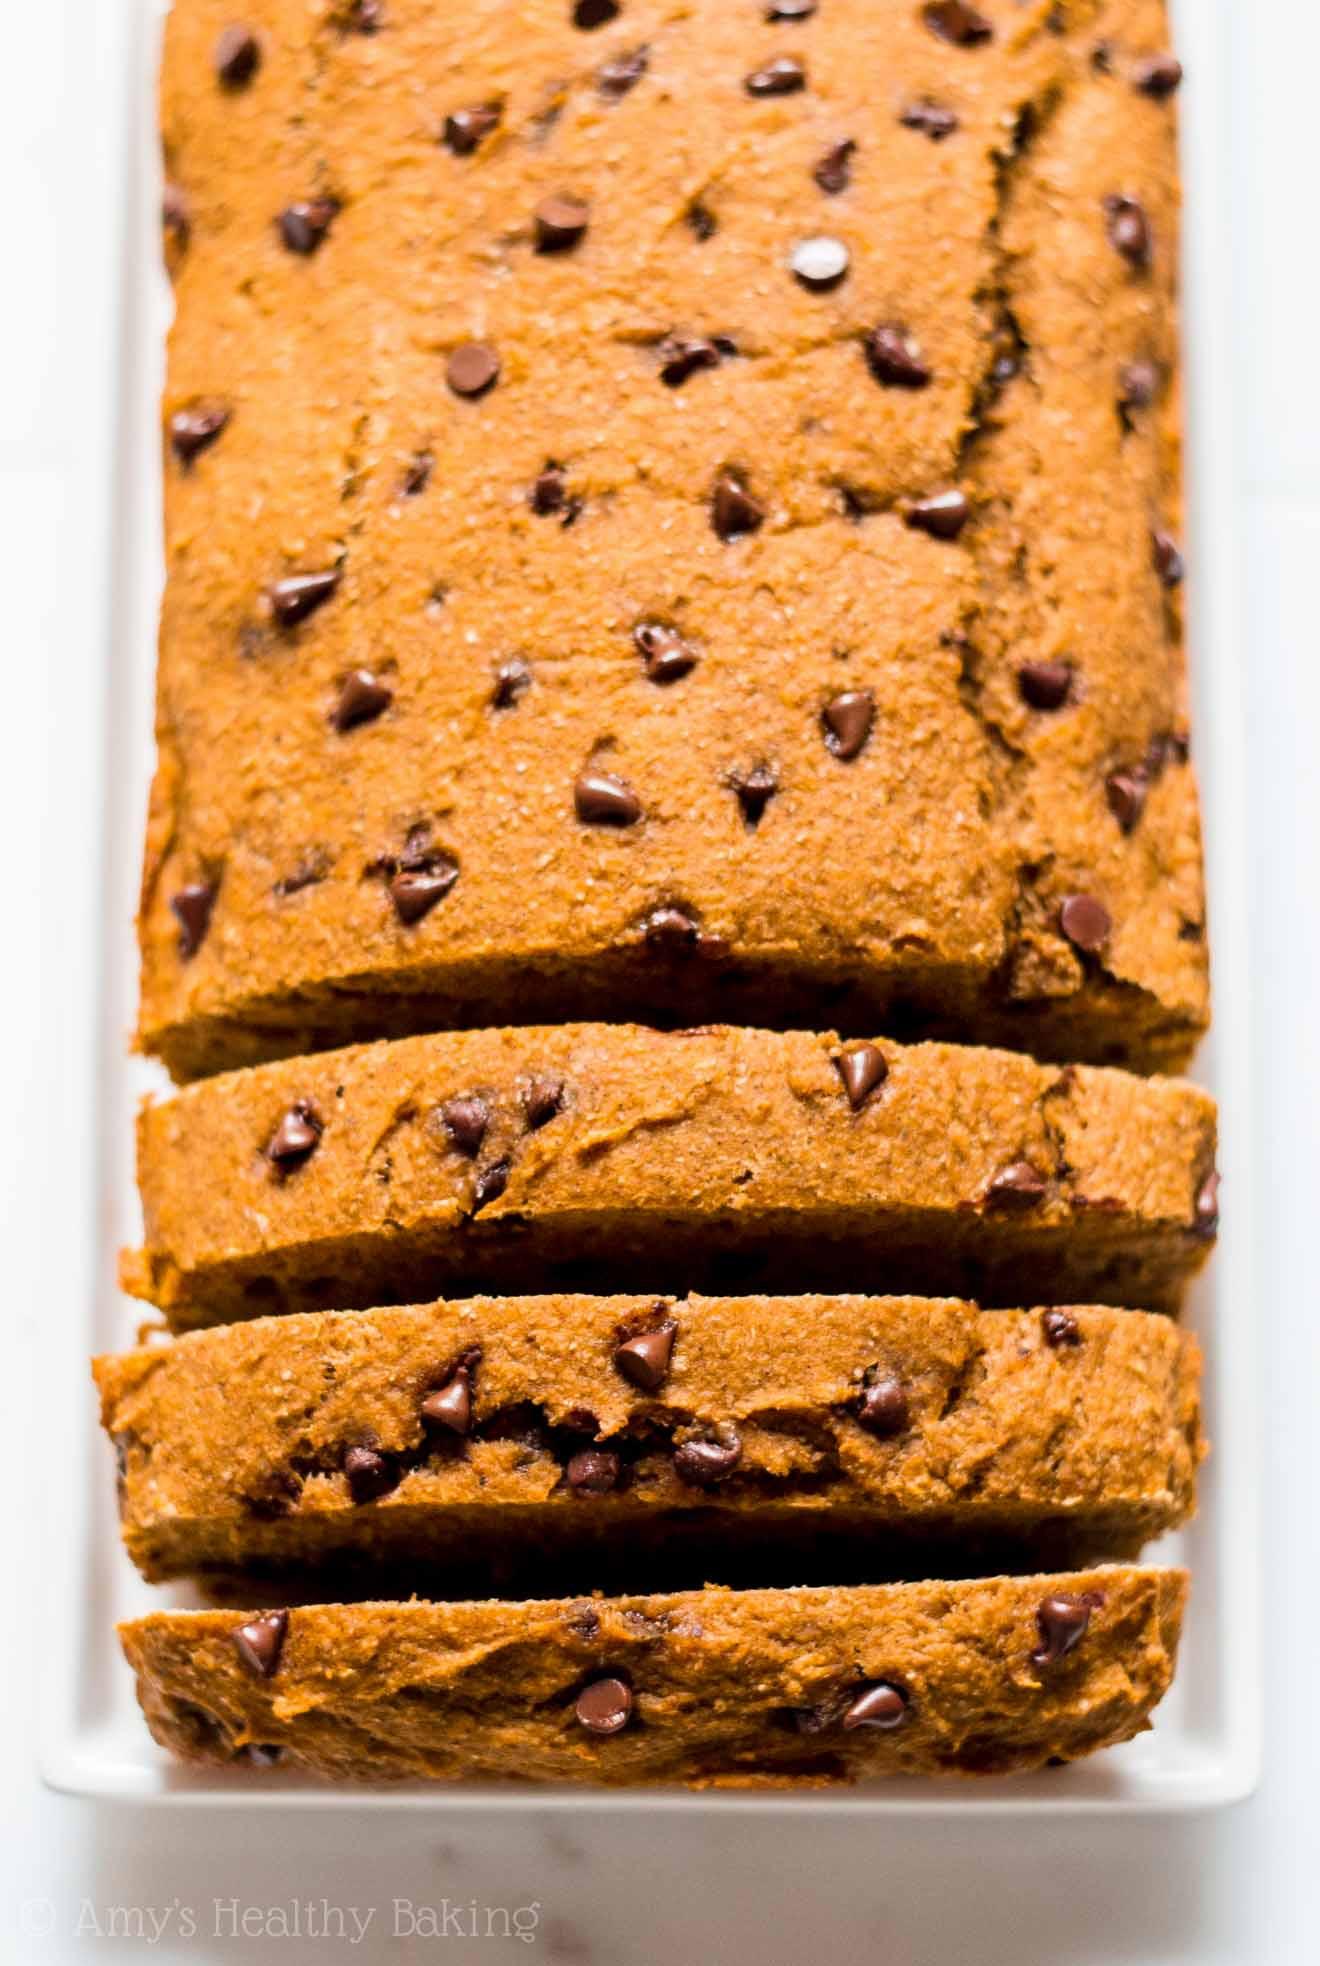 Baking Healthy Bread  Chocolate Chip Pumpkin Bread